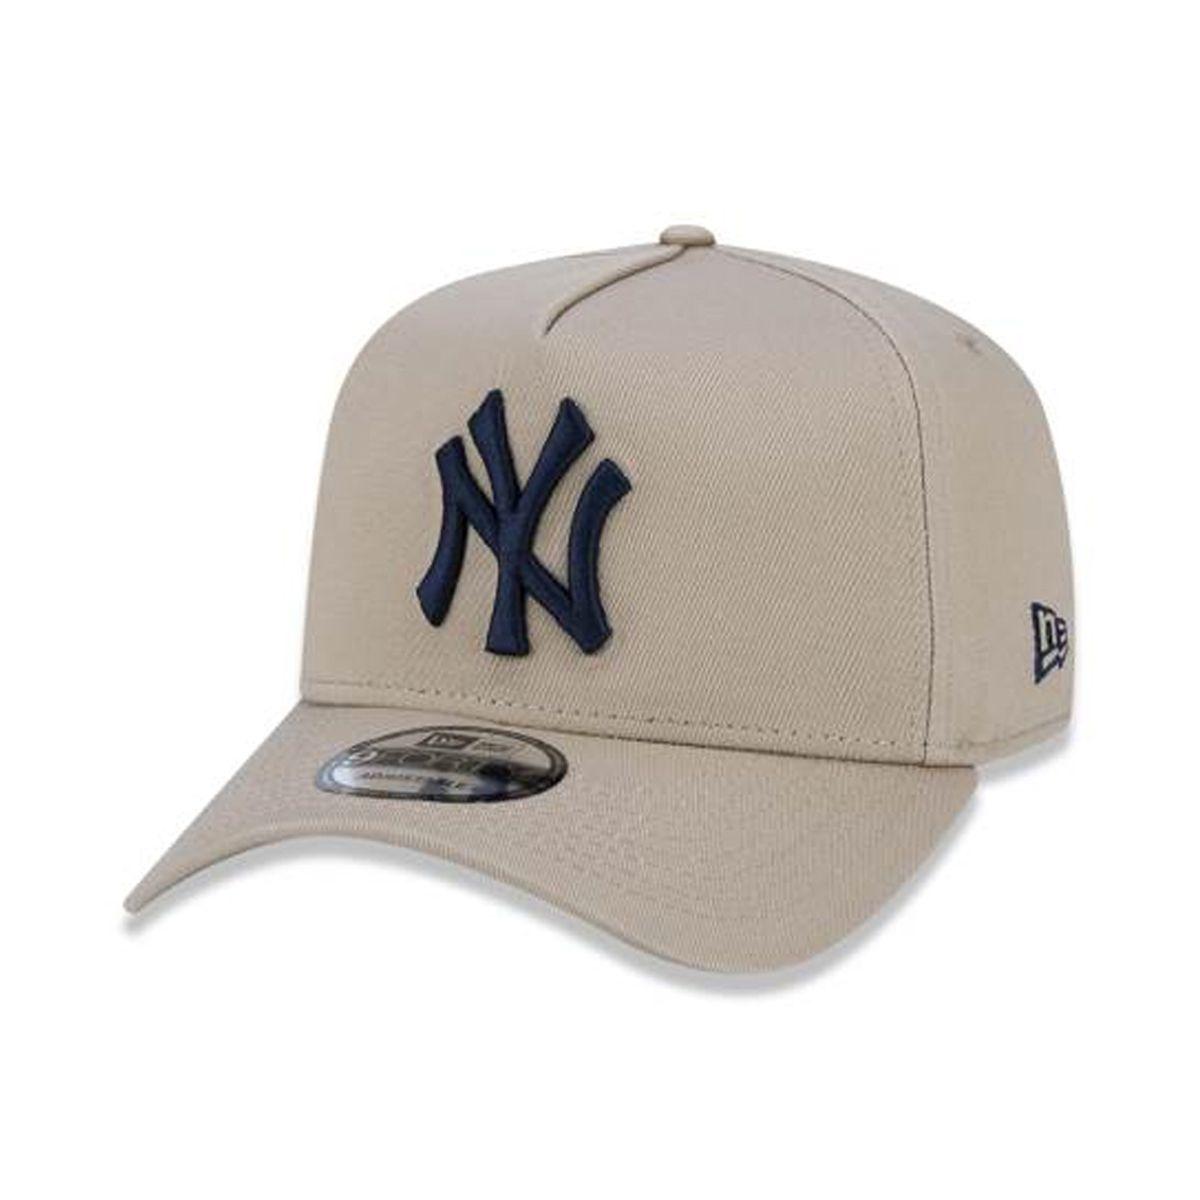 Boné New Era Masculino Yankees Bege